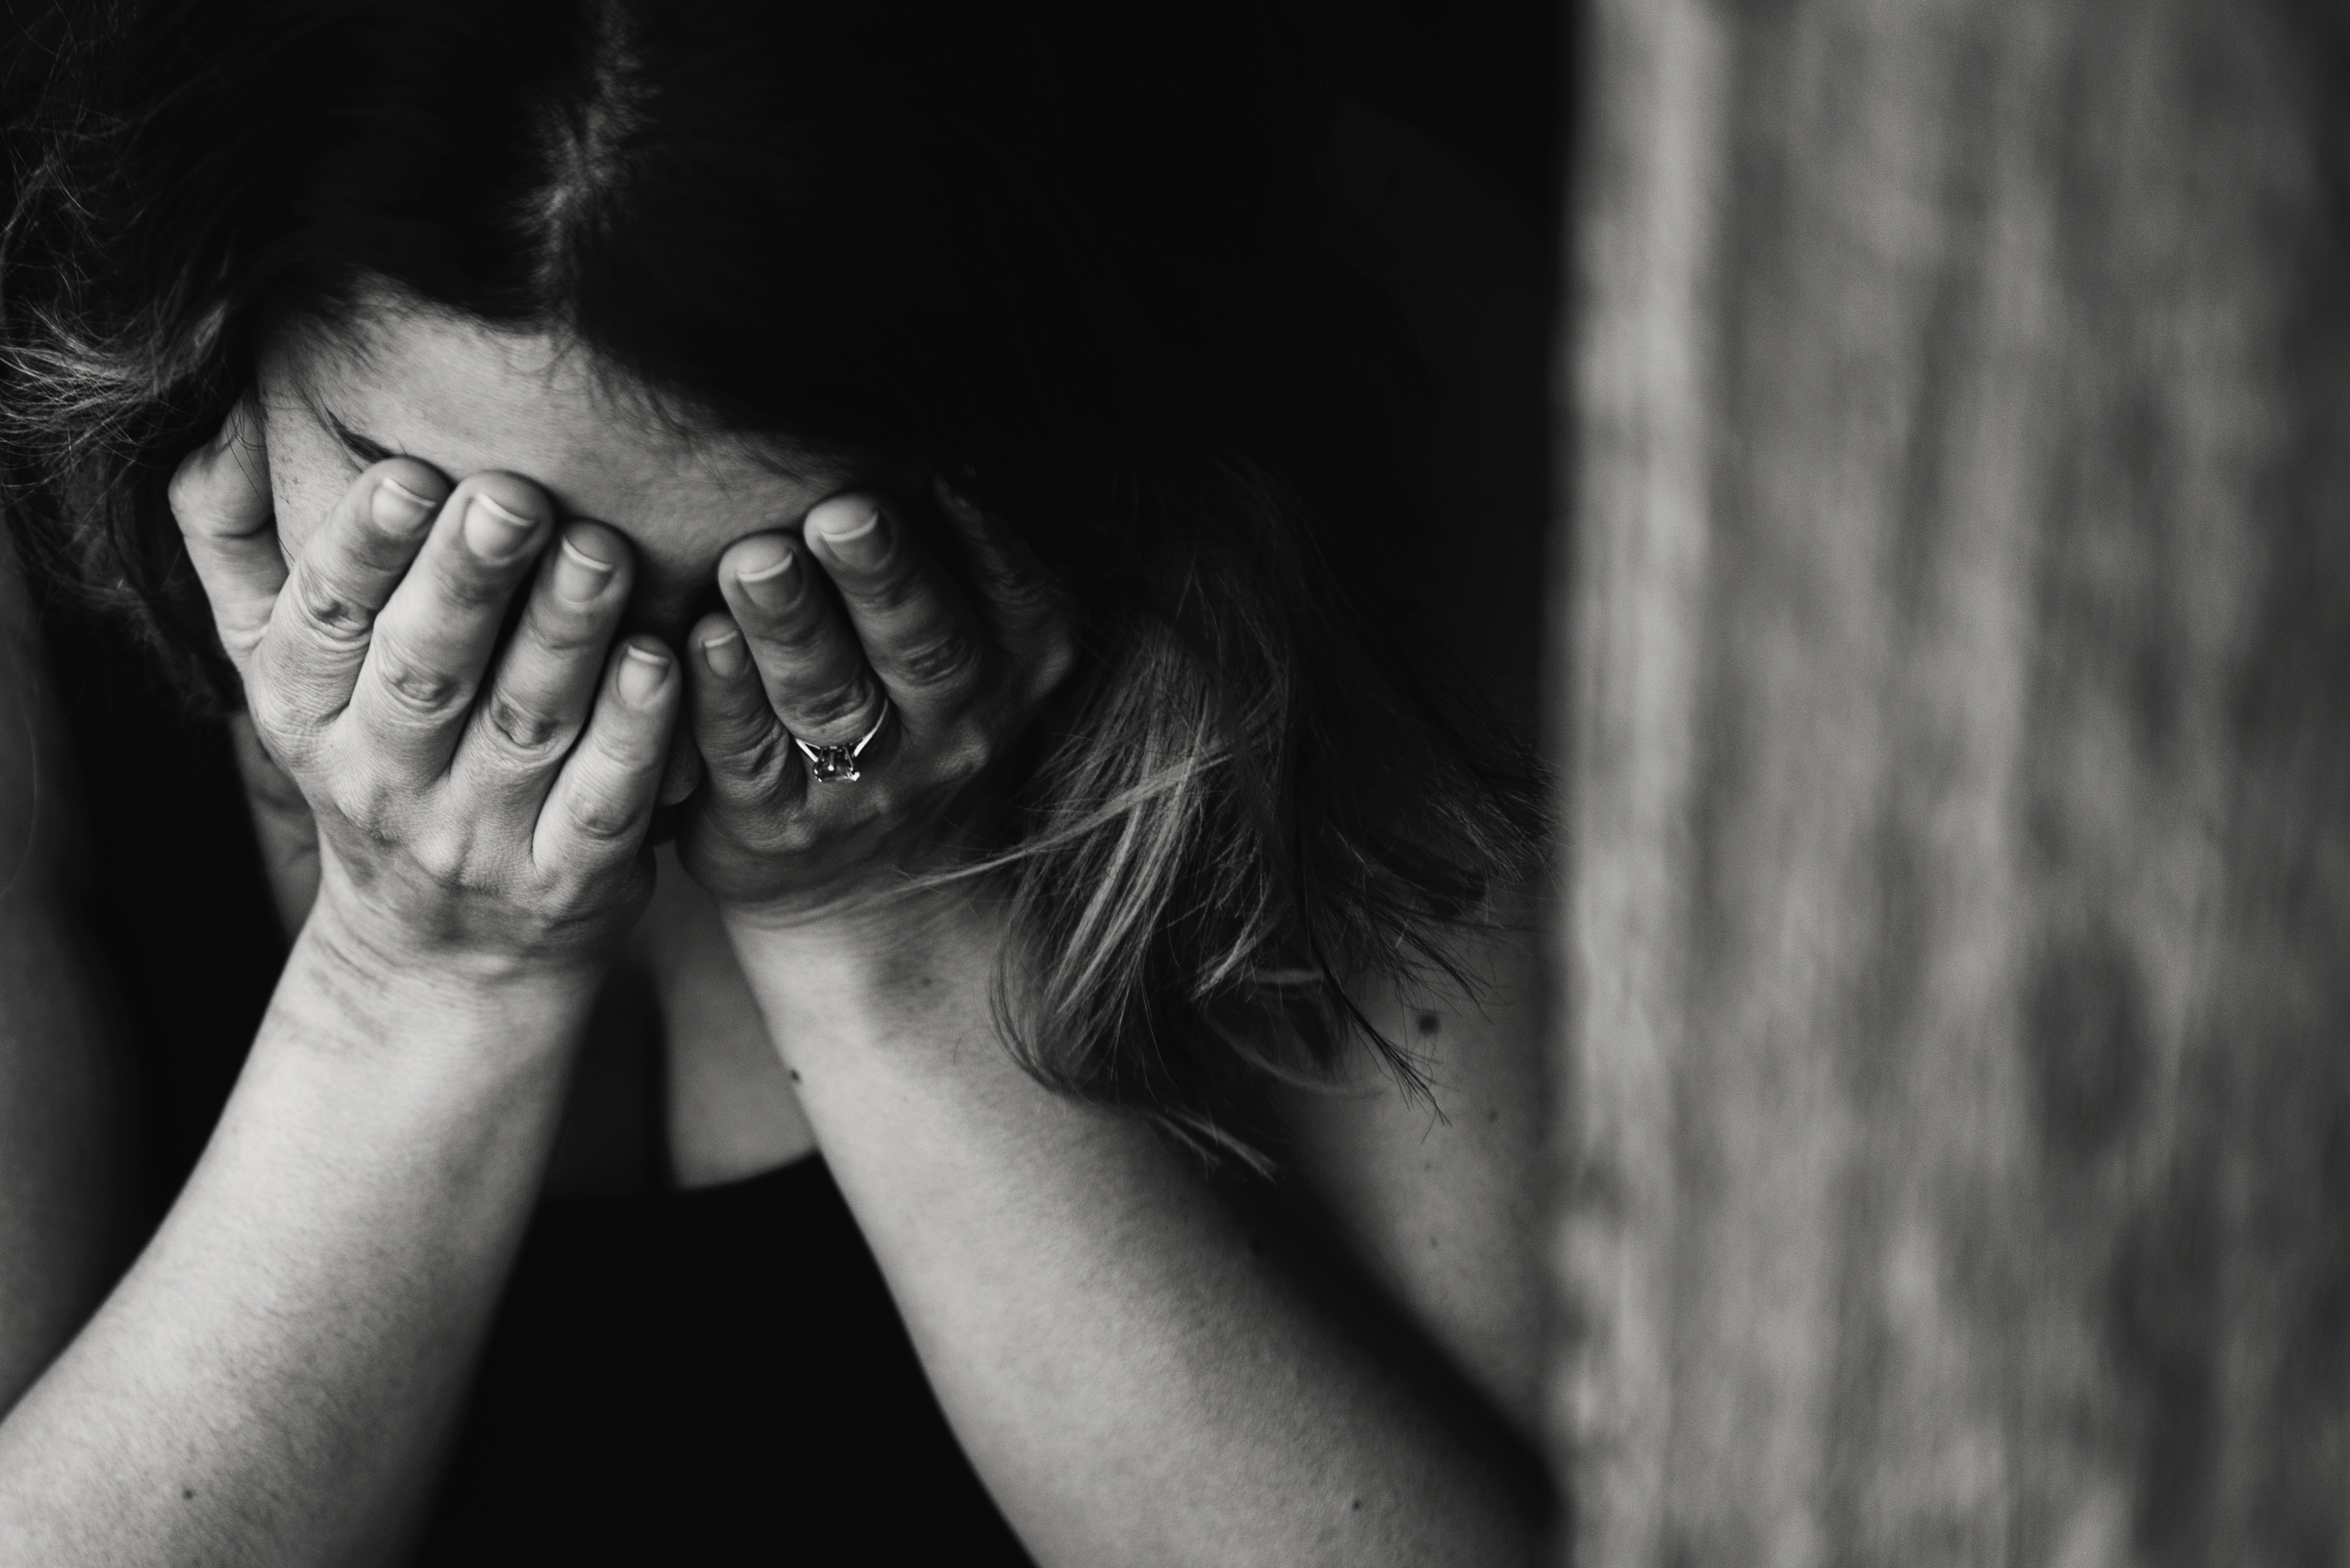 Handling Divorce as an Adult Child